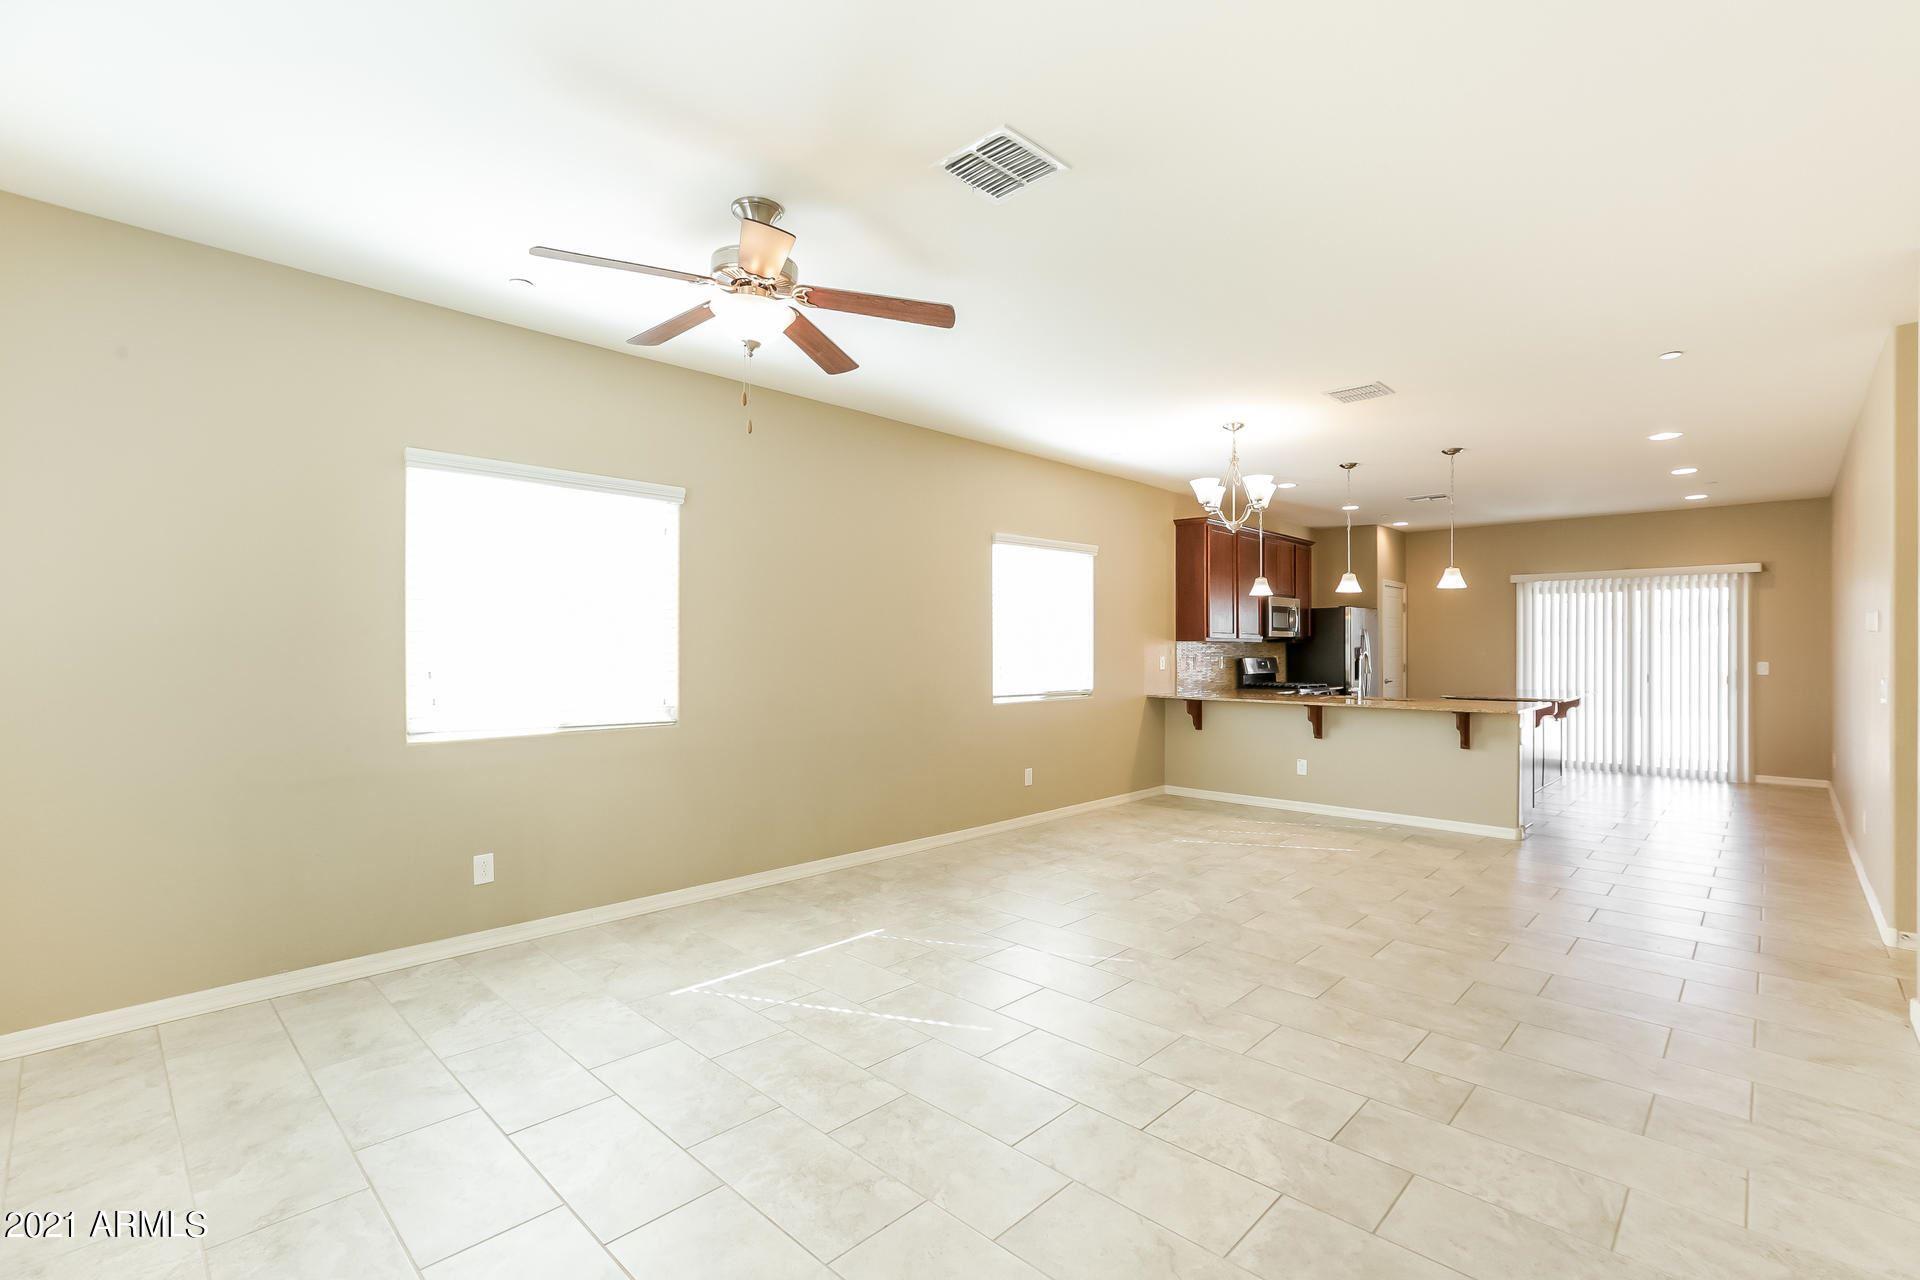 Photo of 21385 W MONTE VISTA Road, Buckeye, AZ 85396 (MLS # 6199662)